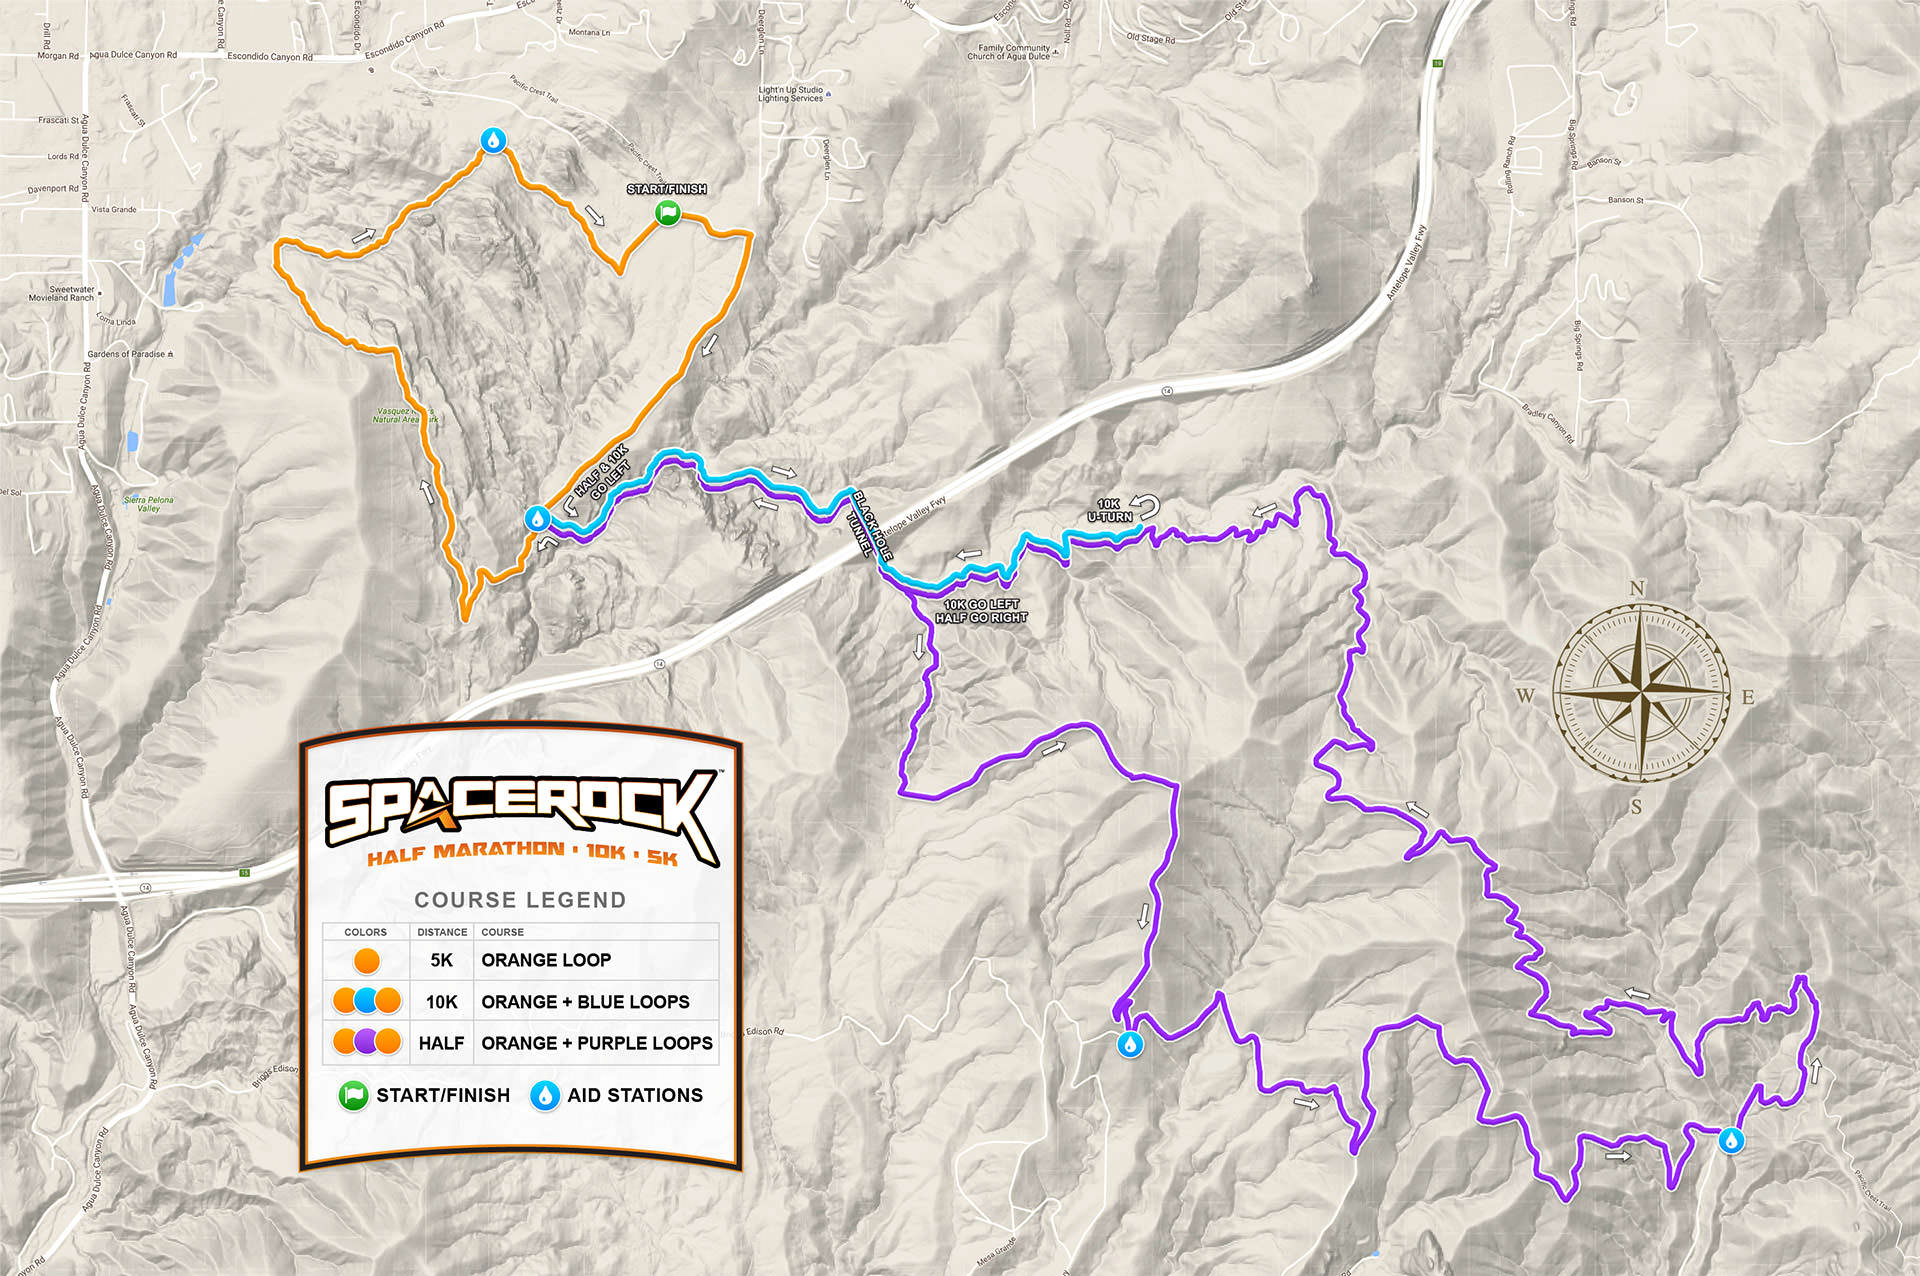 SPACEROCK Trail Race Course Map